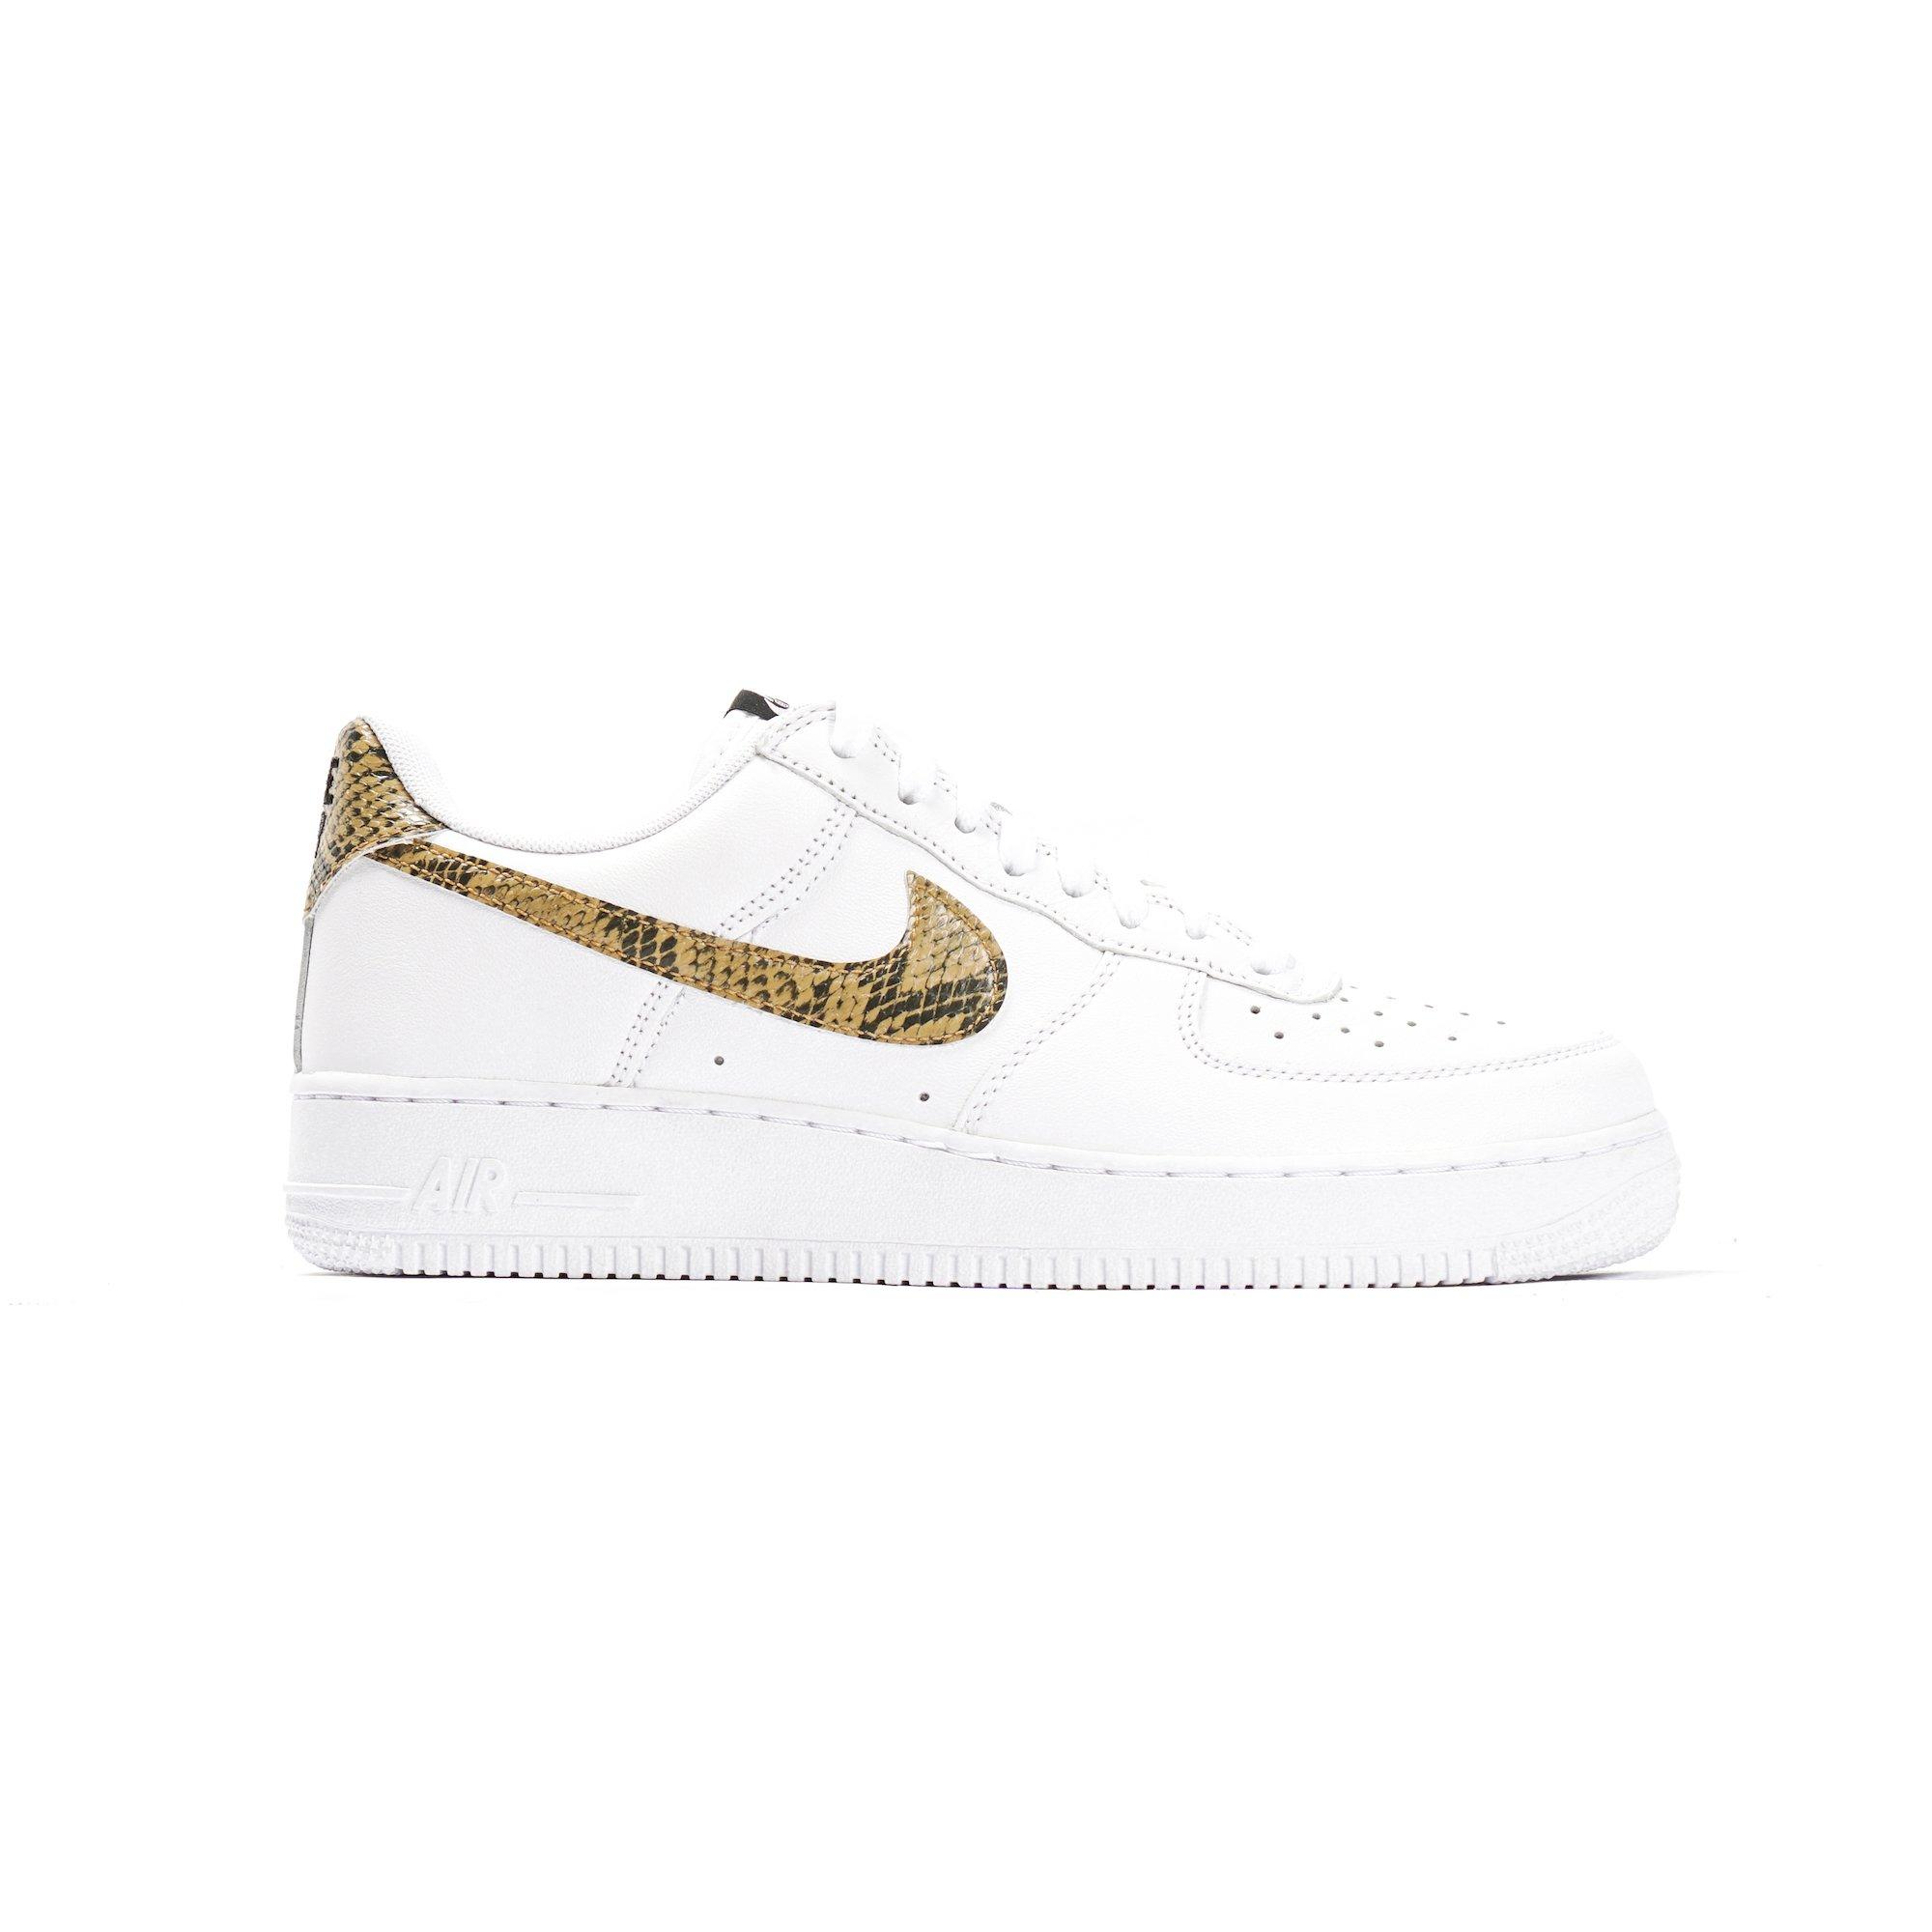 Nike AIR FORCE 1 LOW RETRO PRM QS -